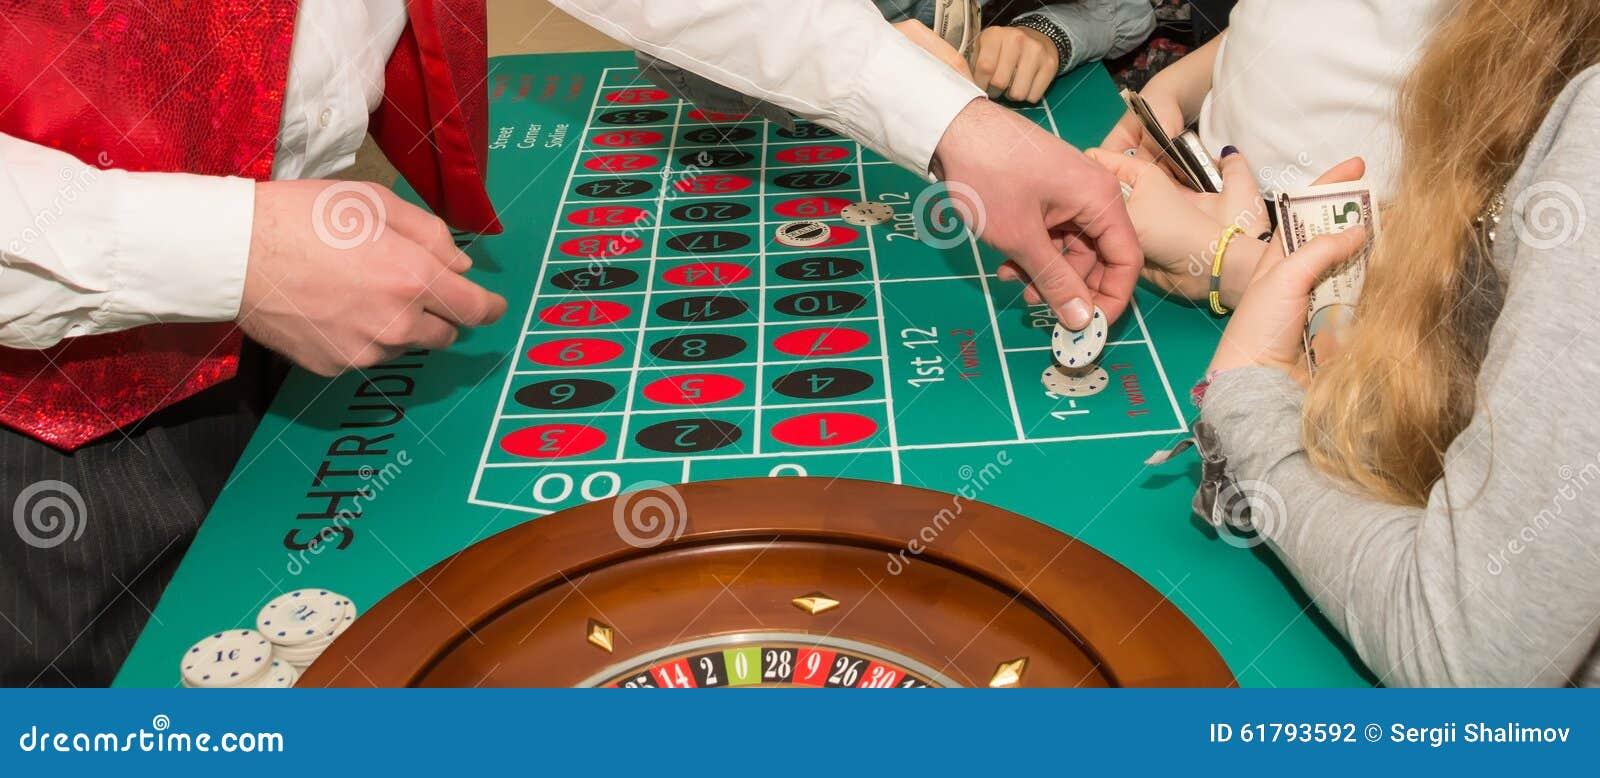 Adult game free poker casino the casino job 2009 free download